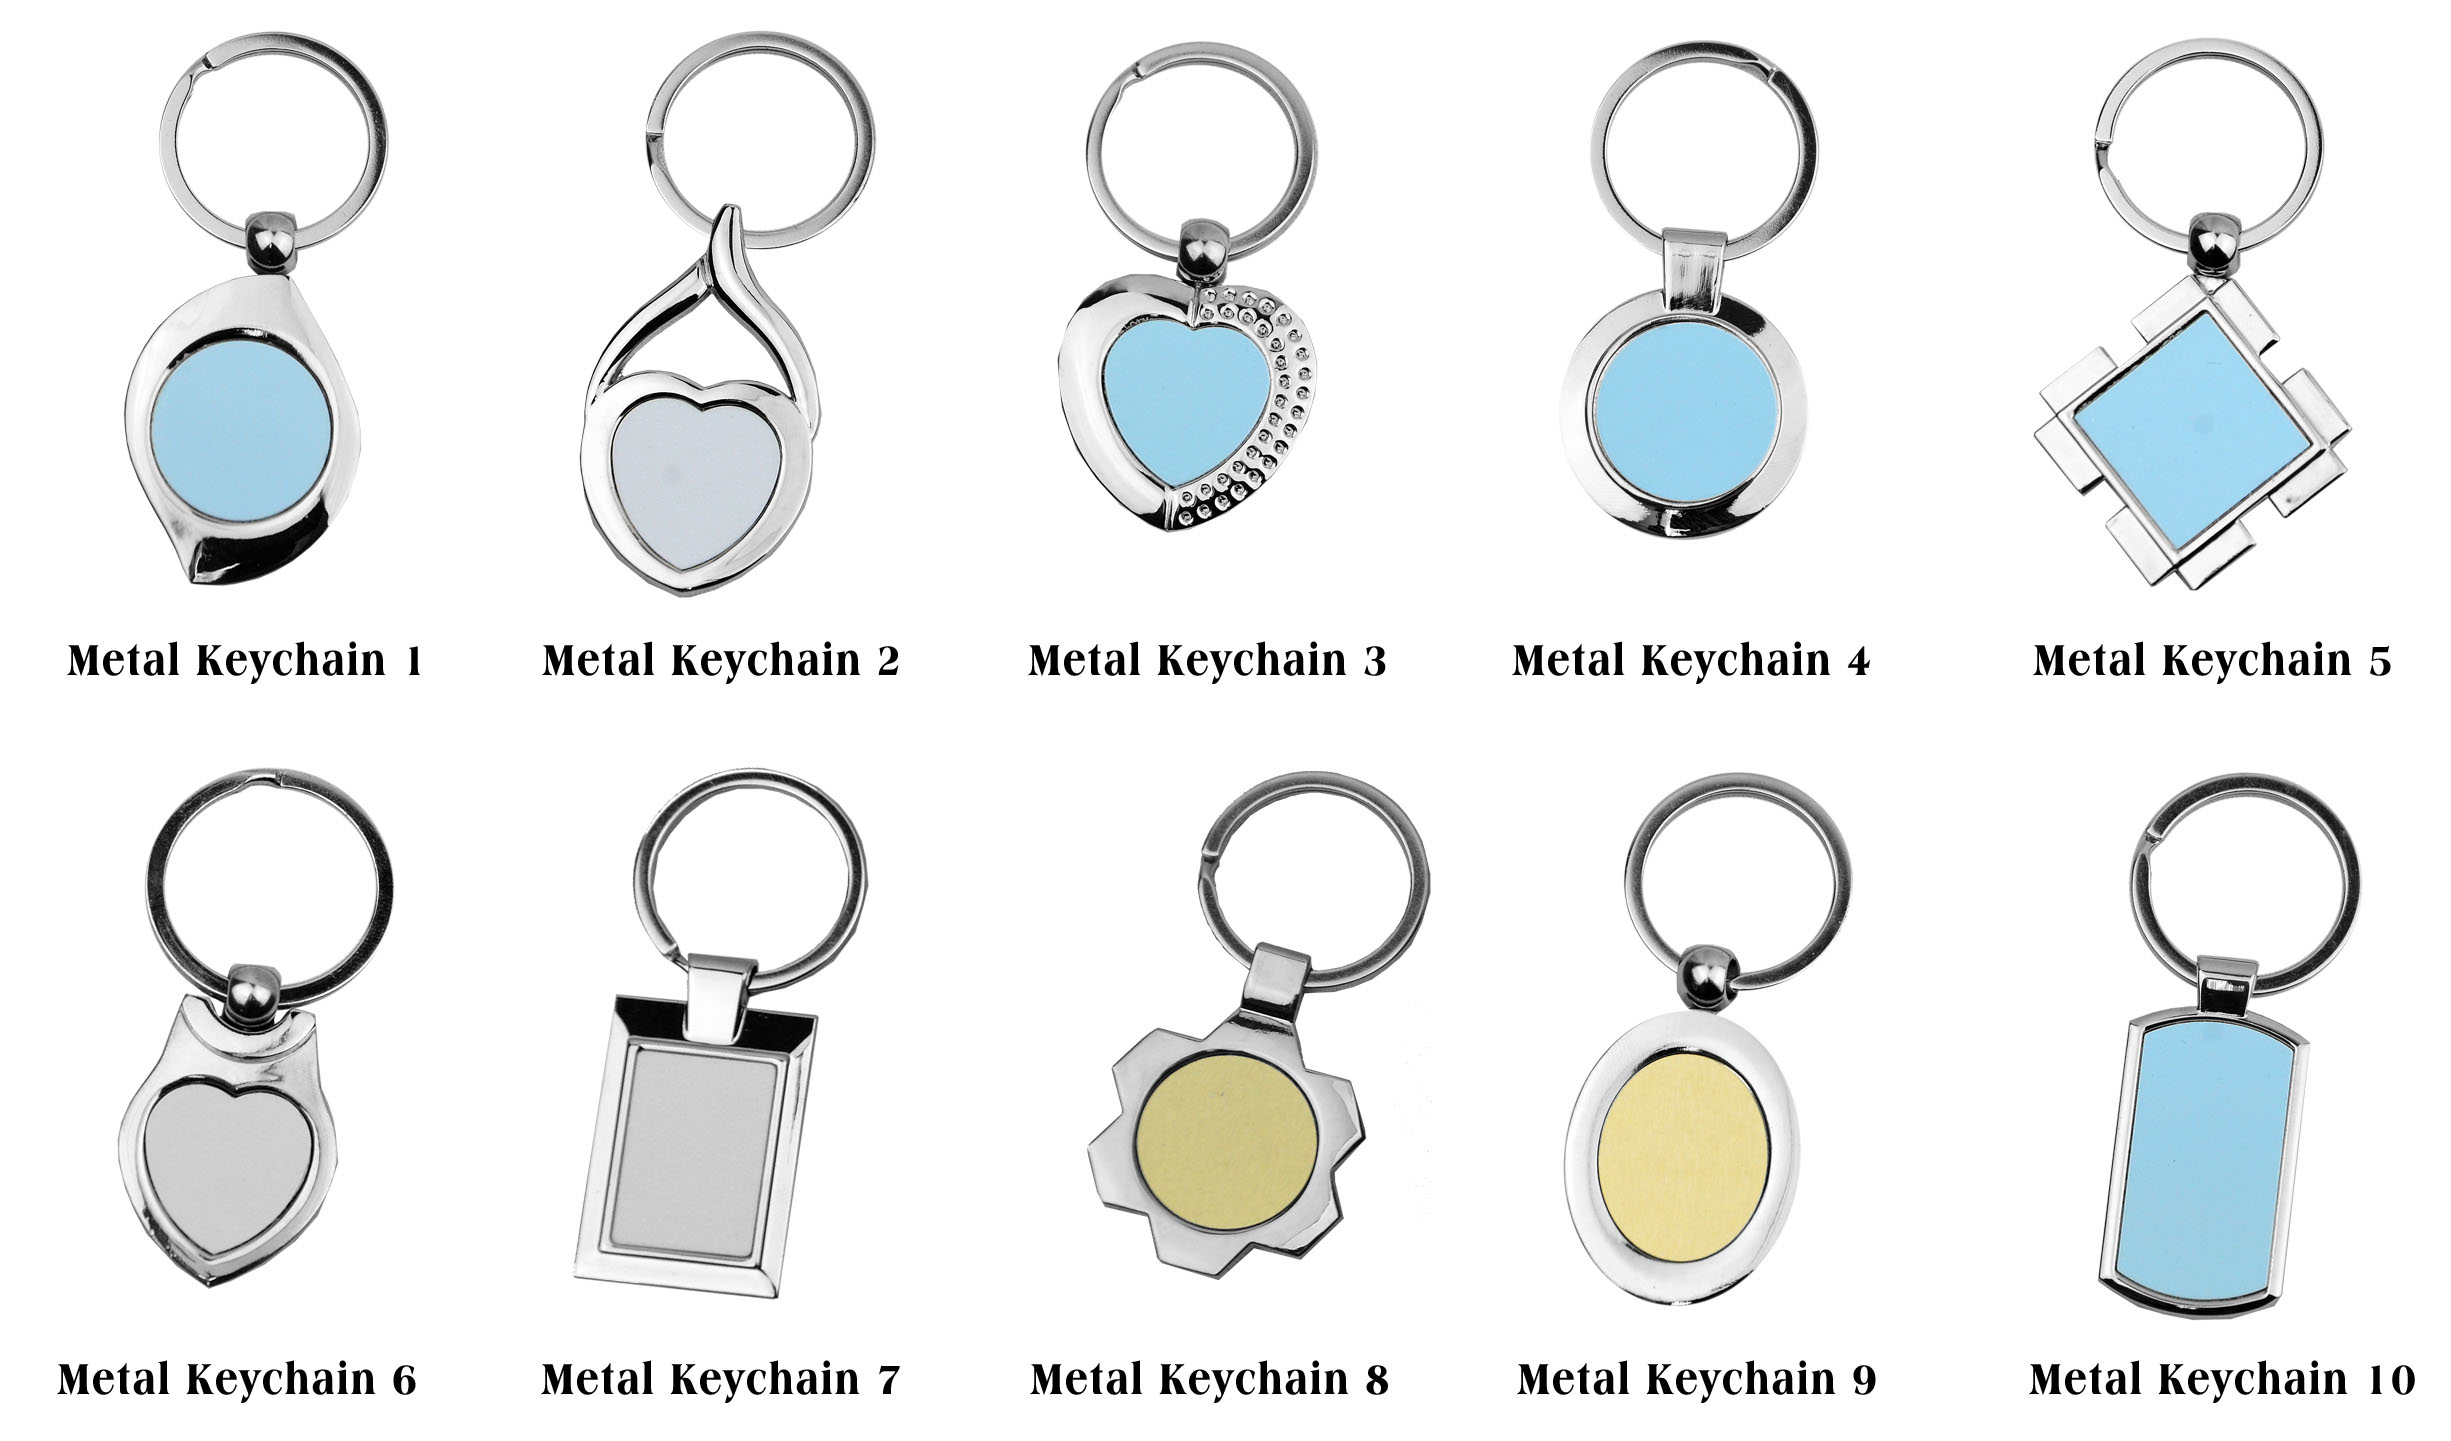 Metal Key Chain Printing Various Keychain Designs In